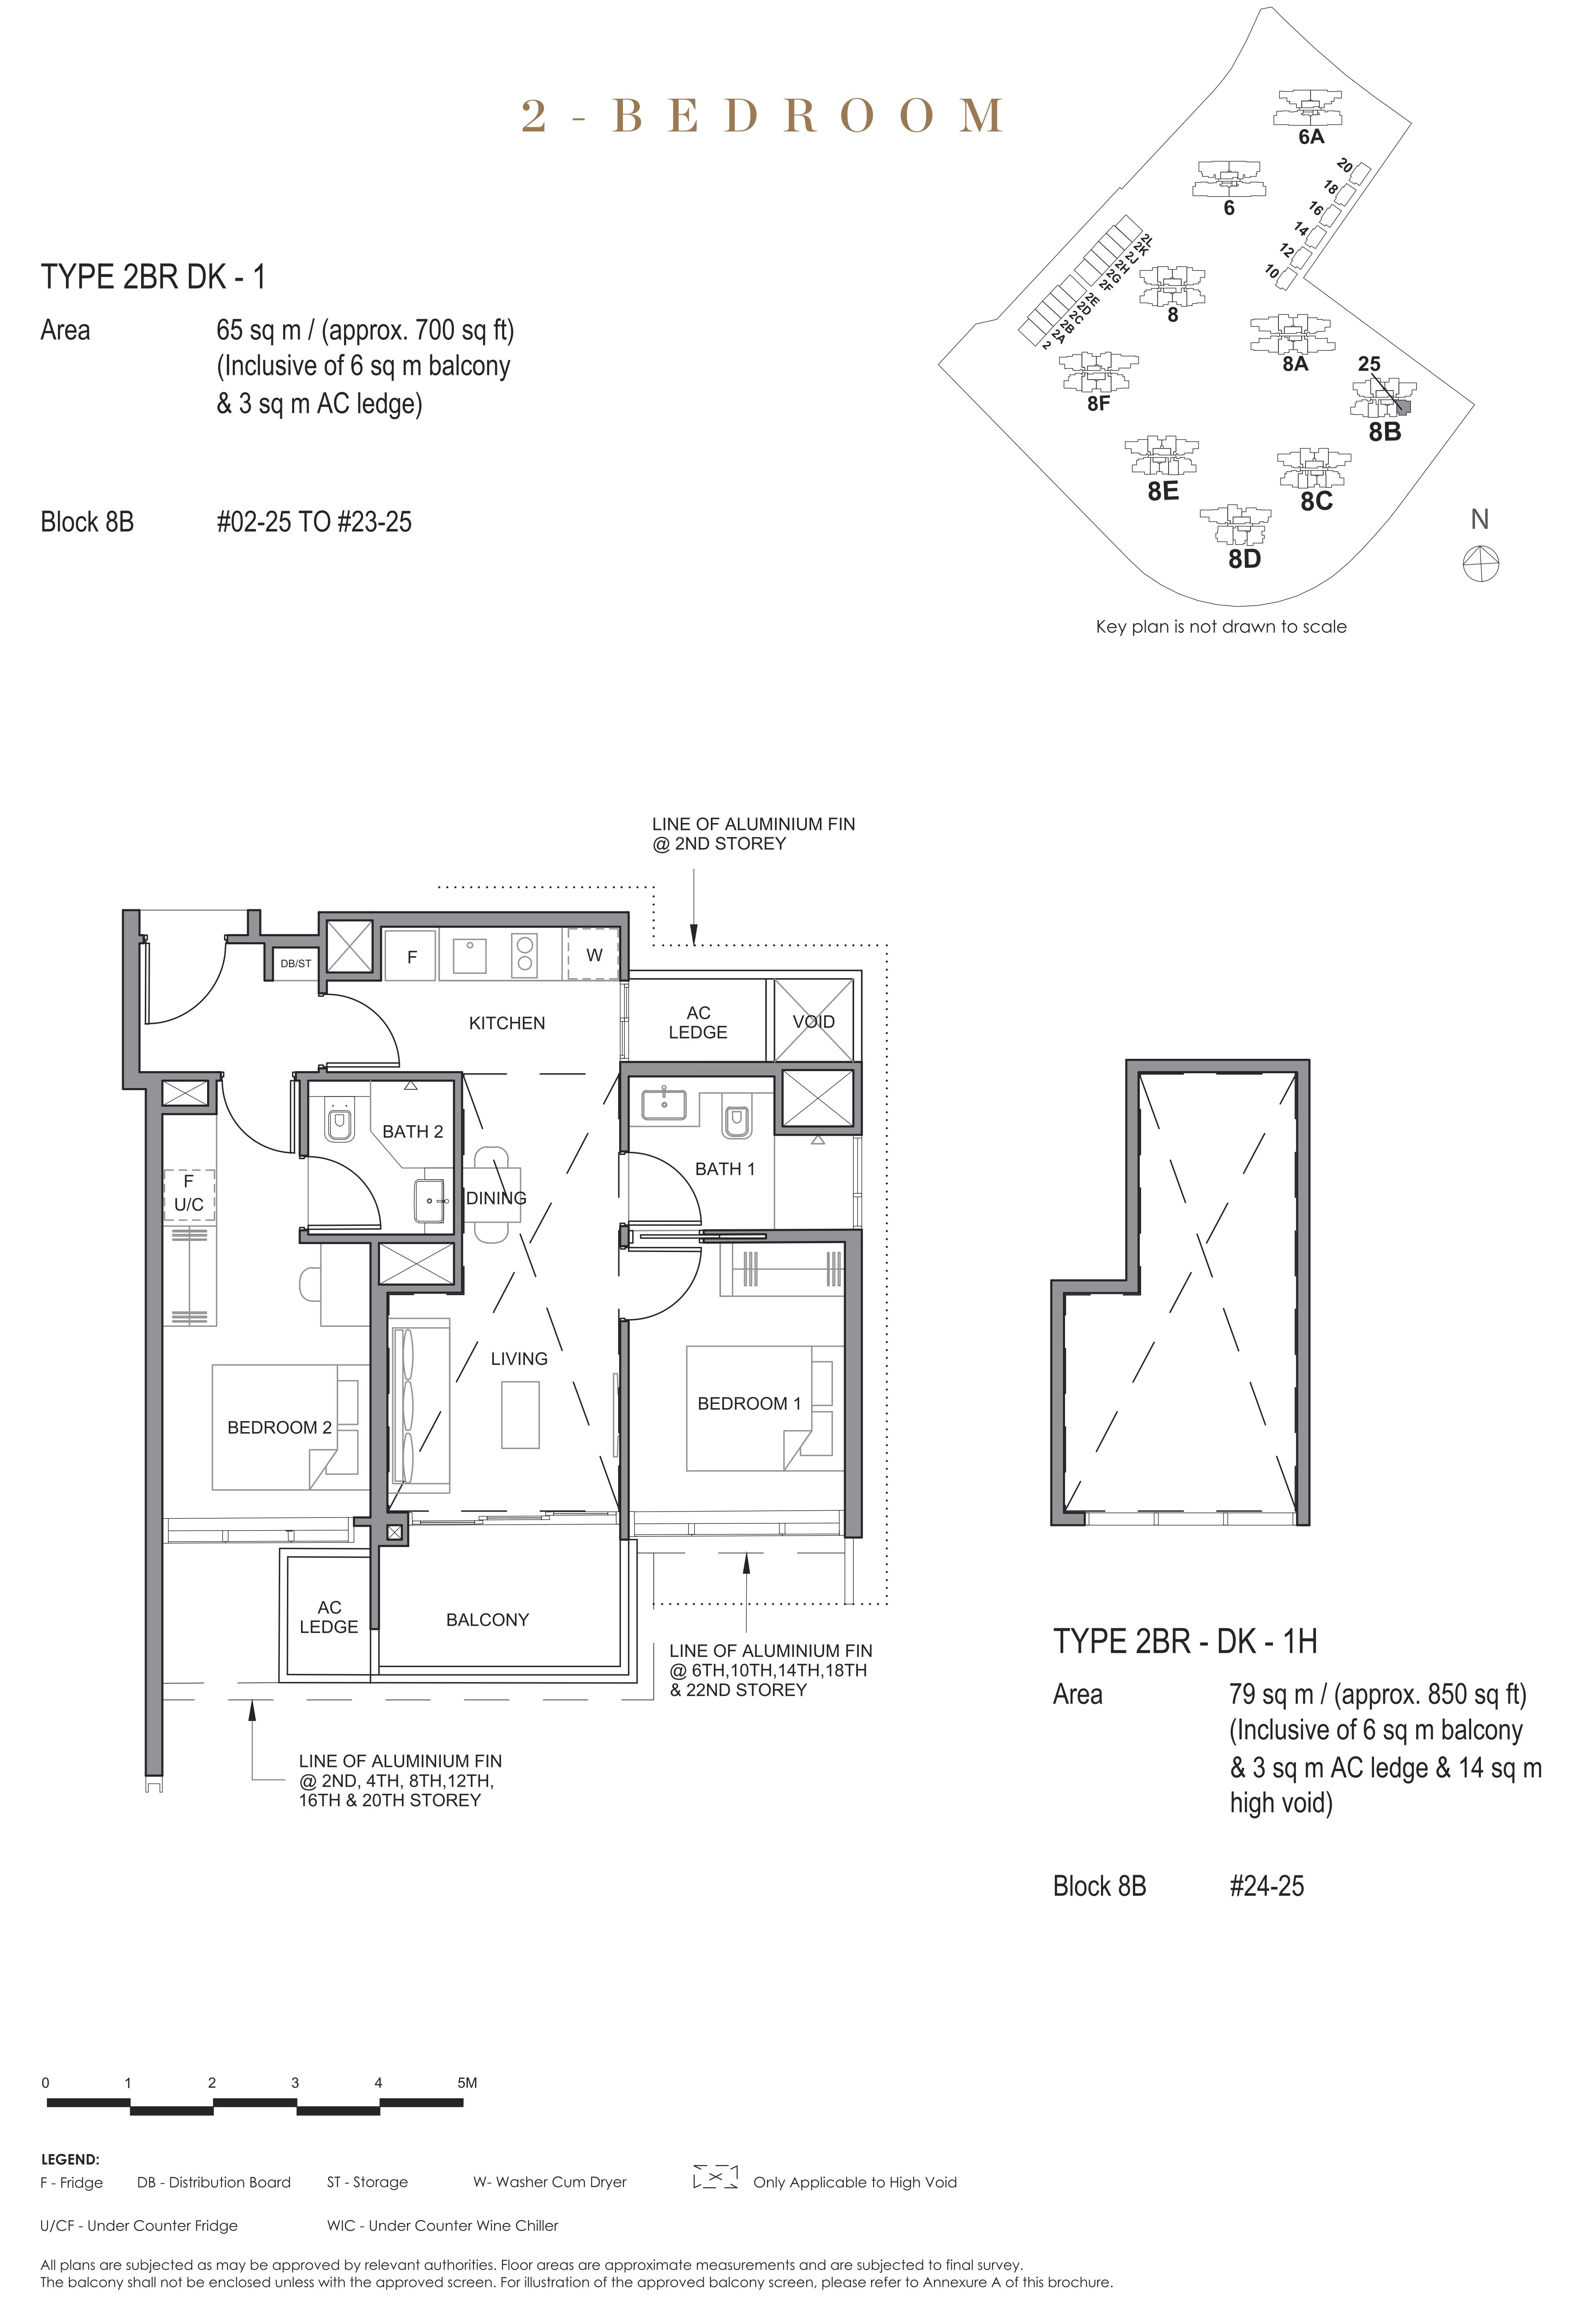 Parc Clematis 锦泰门第 contemporary 2 bedroom dk 2卧房-双钥匙 2BR-dk1